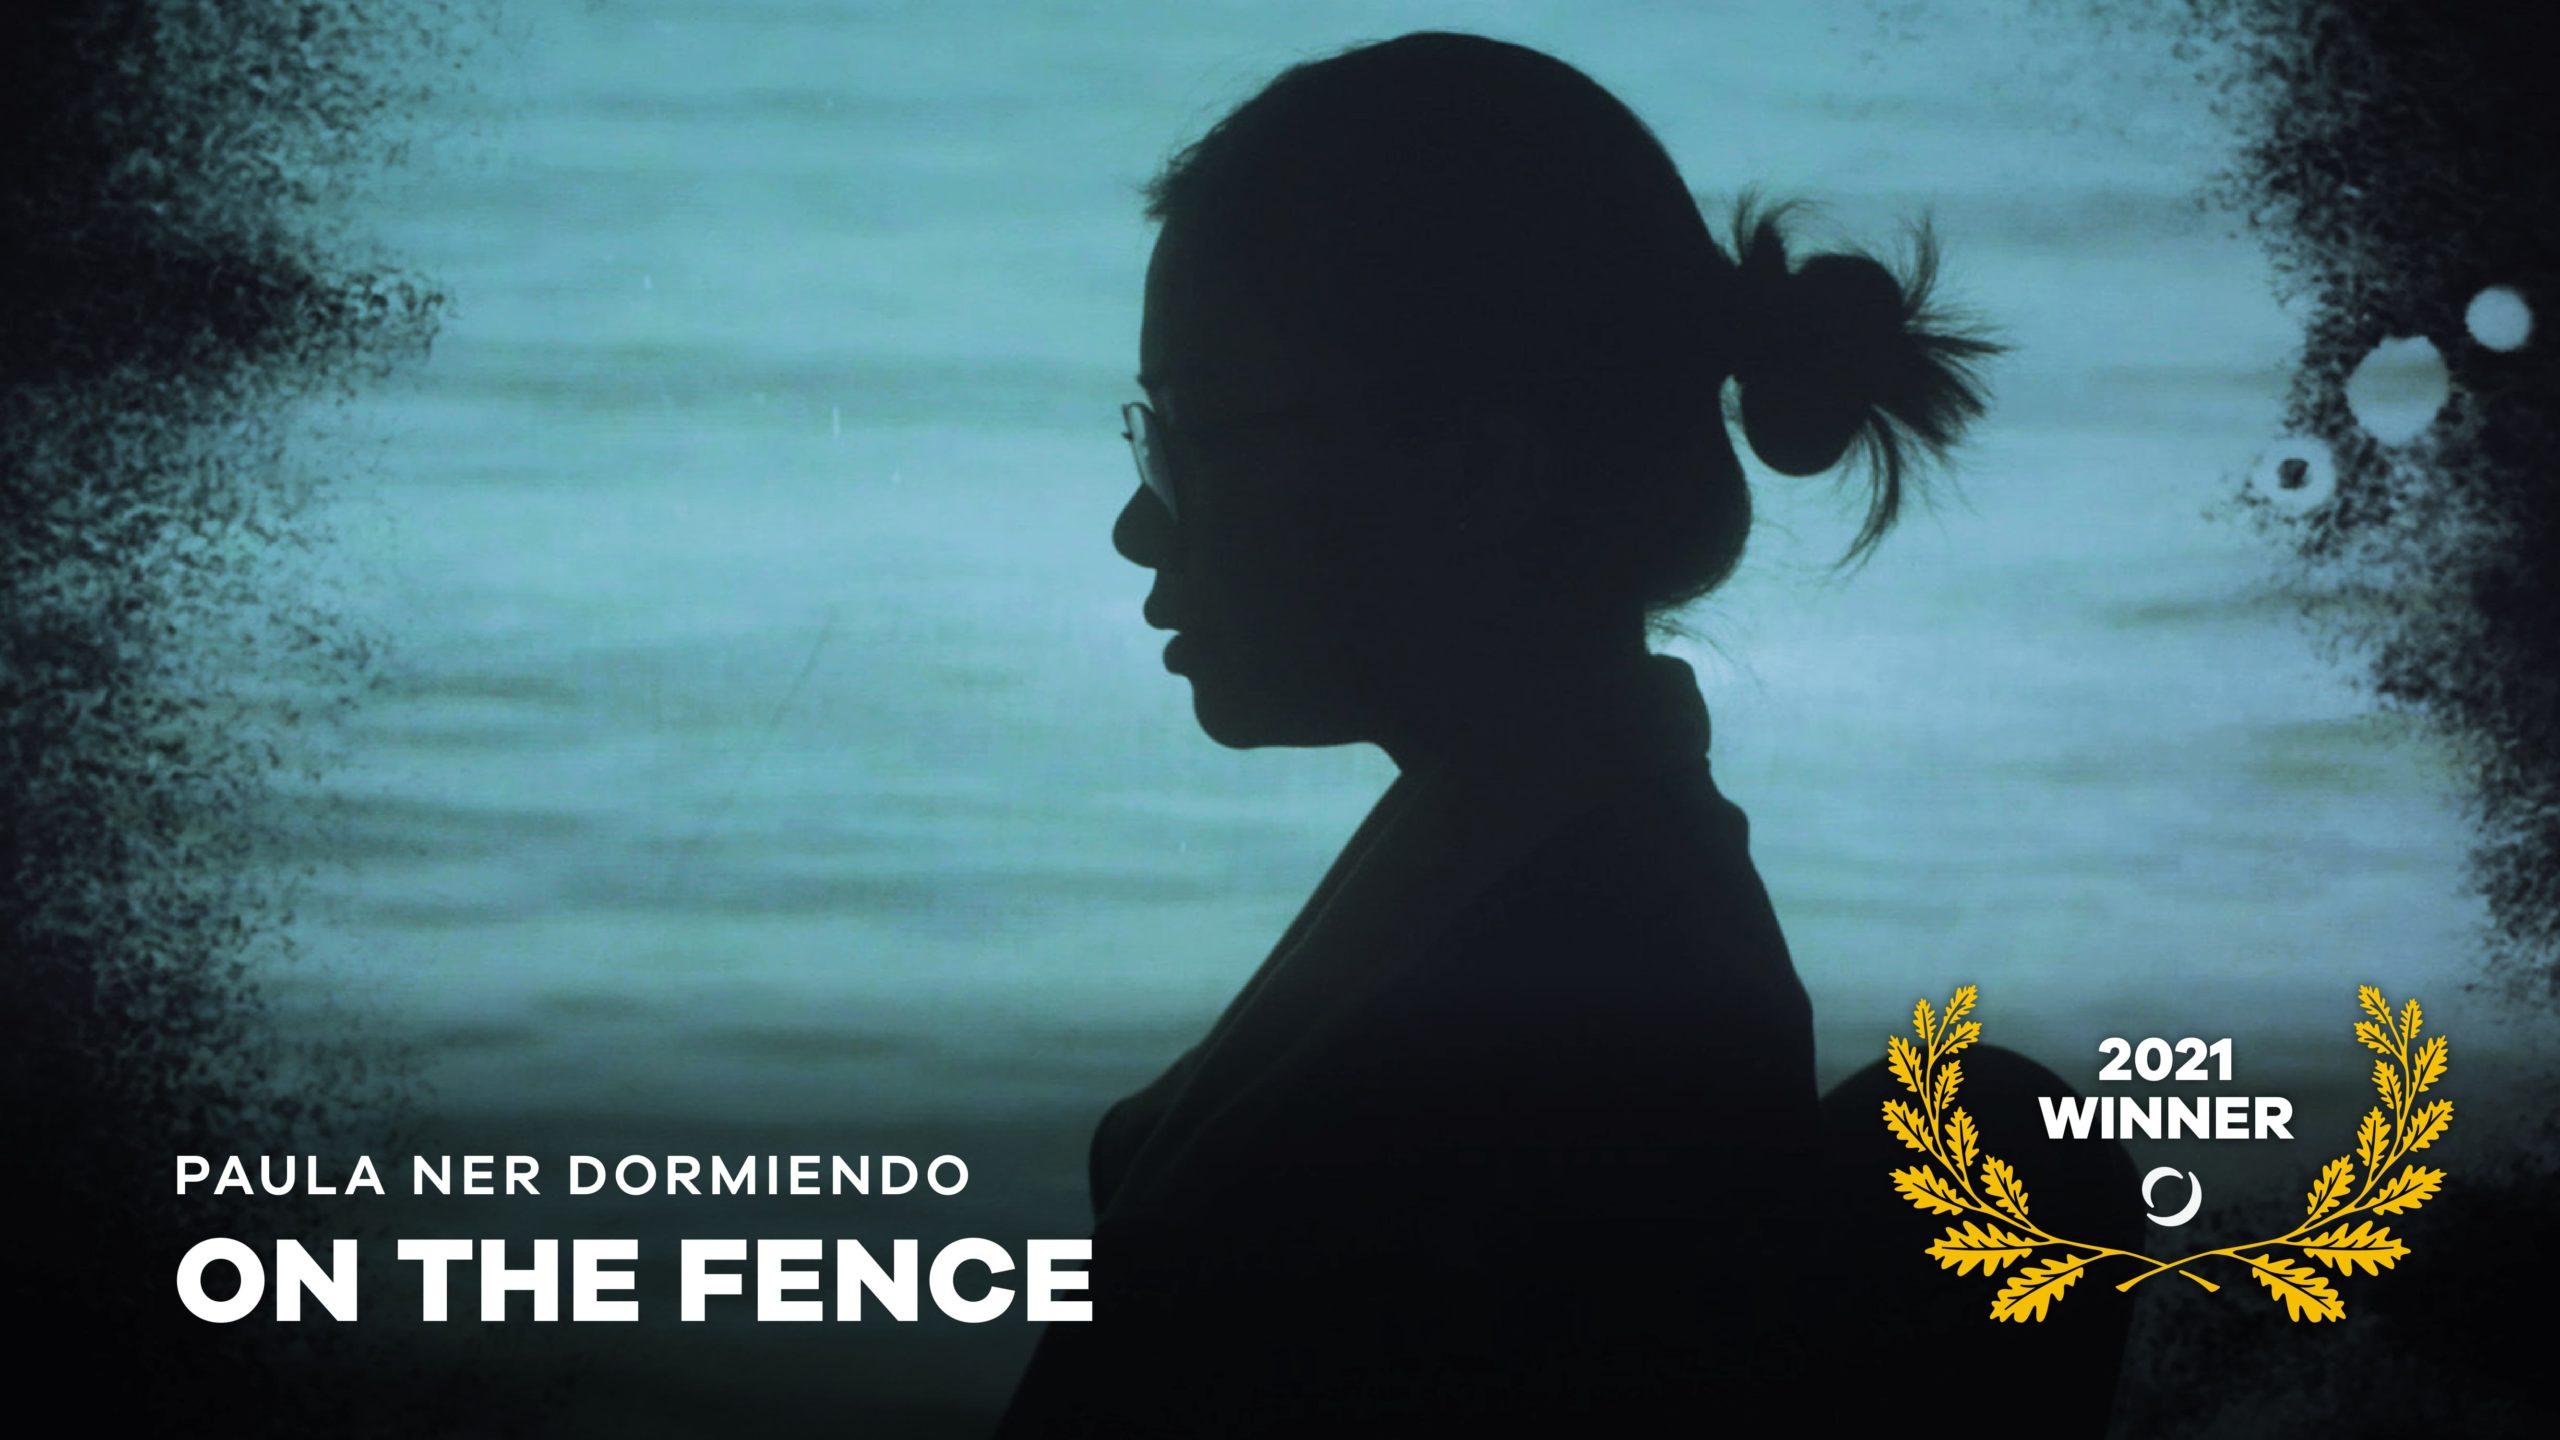 OFFA 2021 Best Student Film Winner